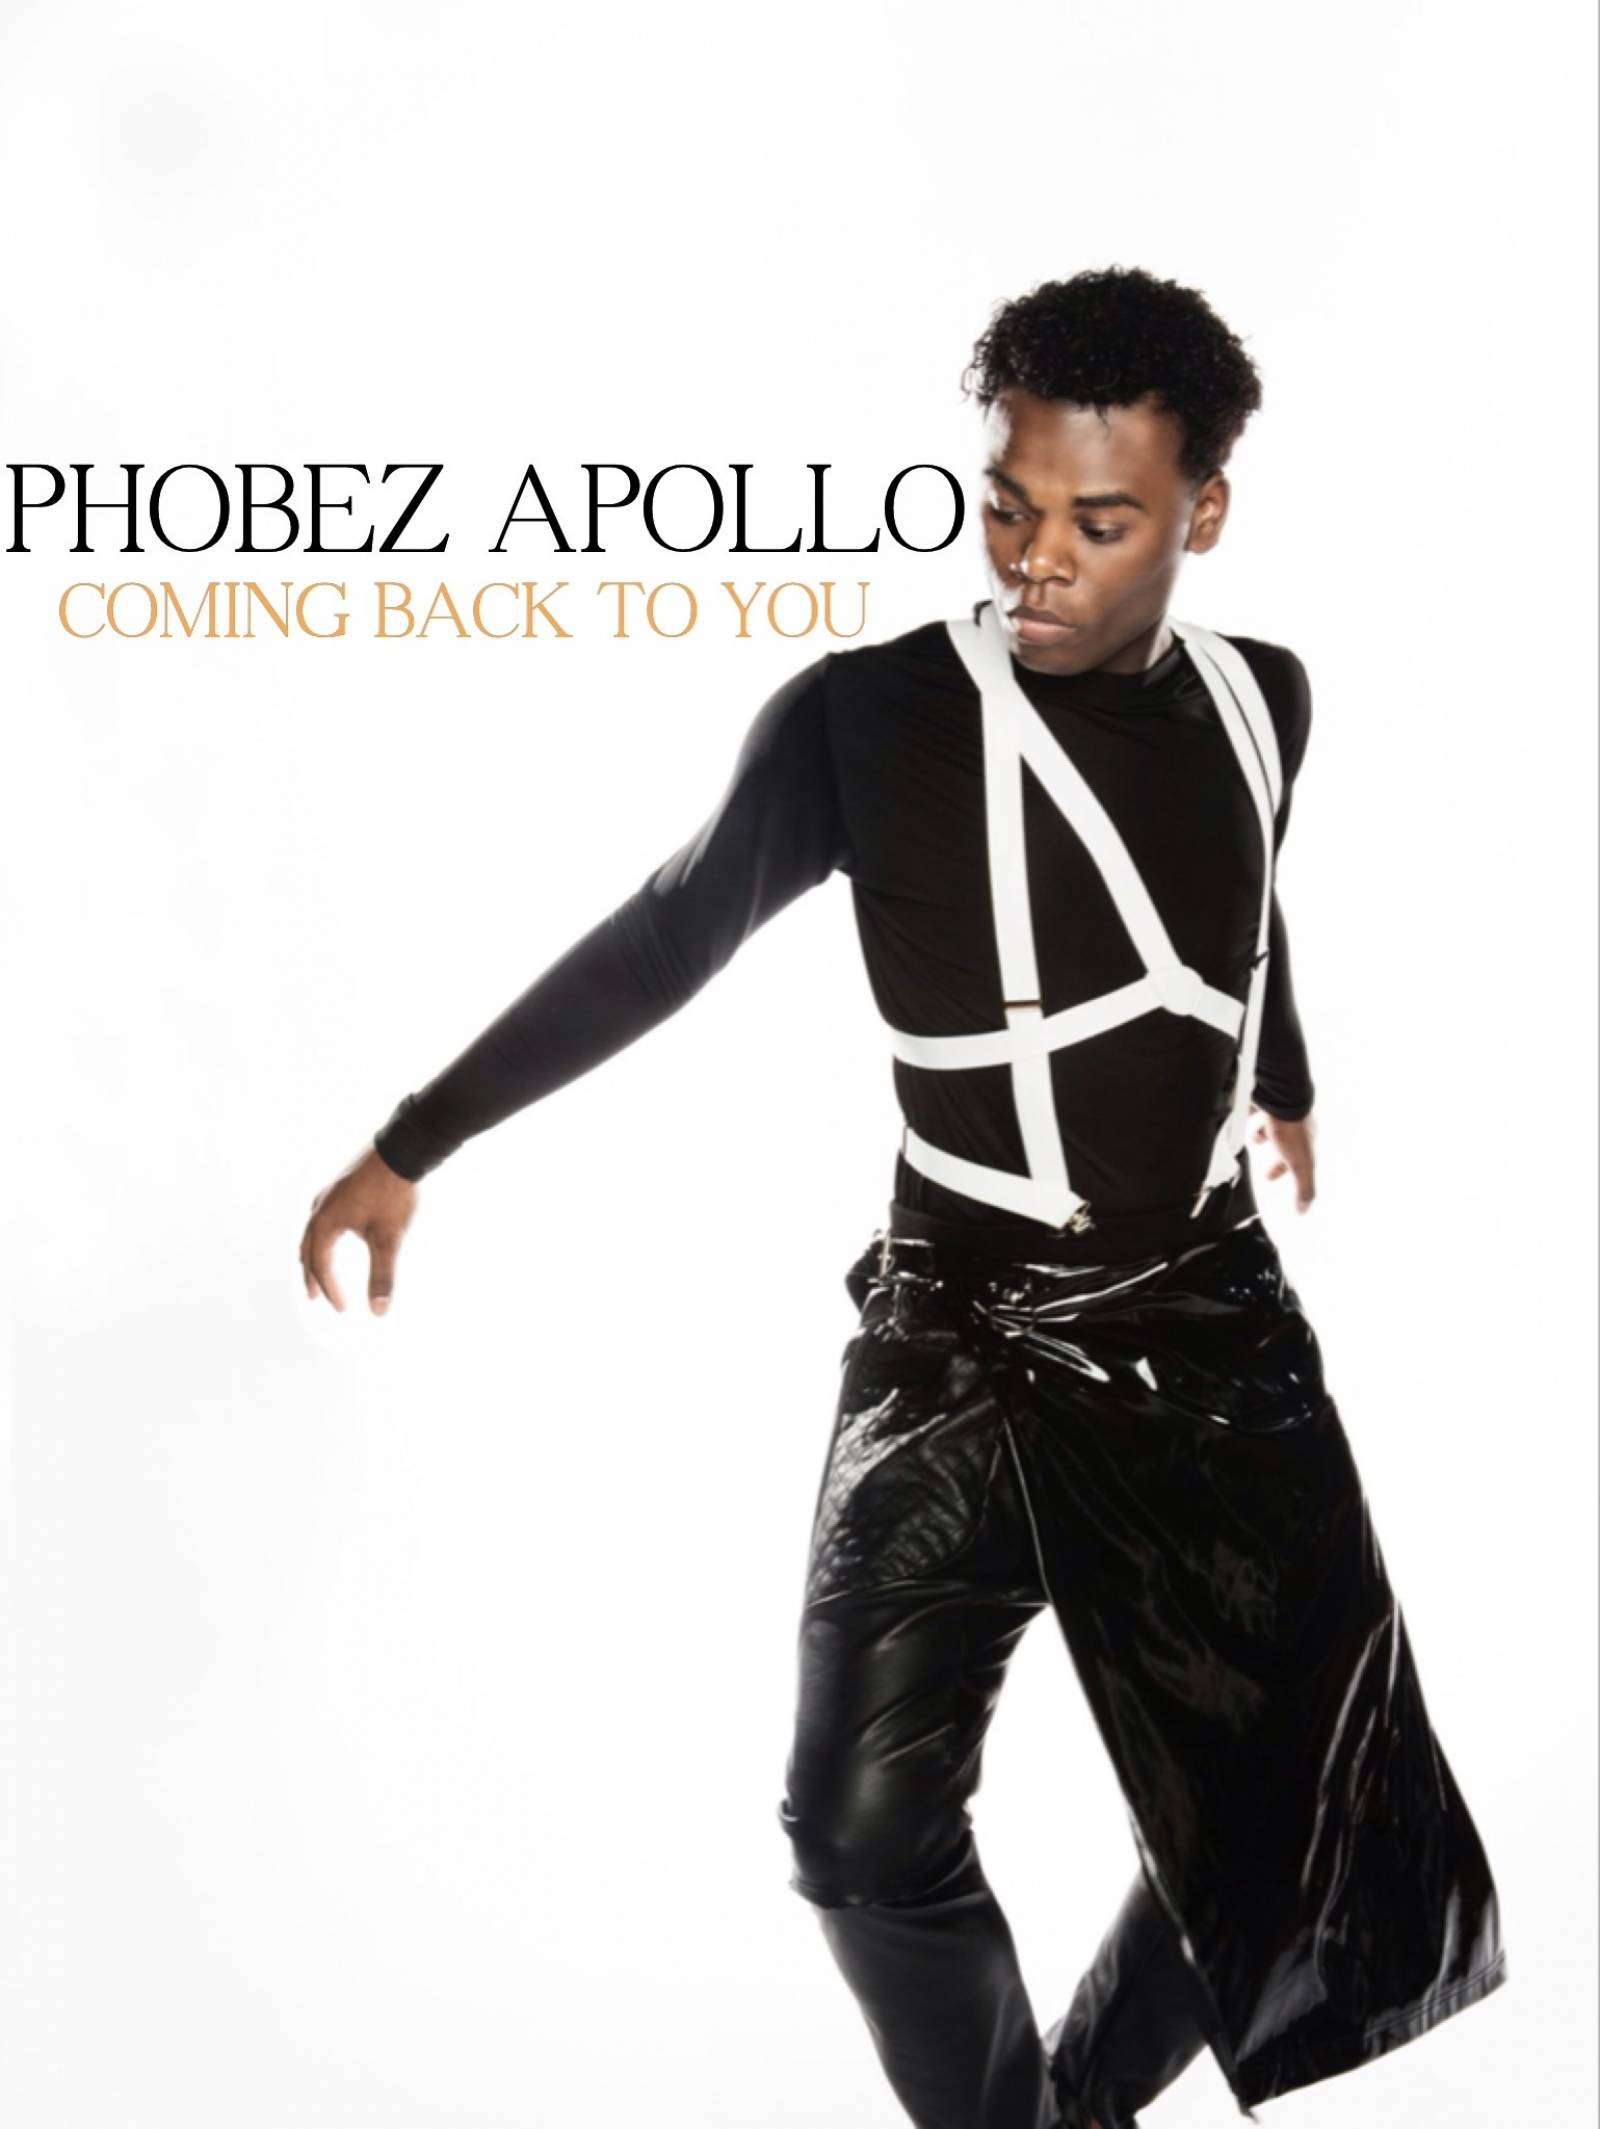 Phobez Apollo Accountant for Music